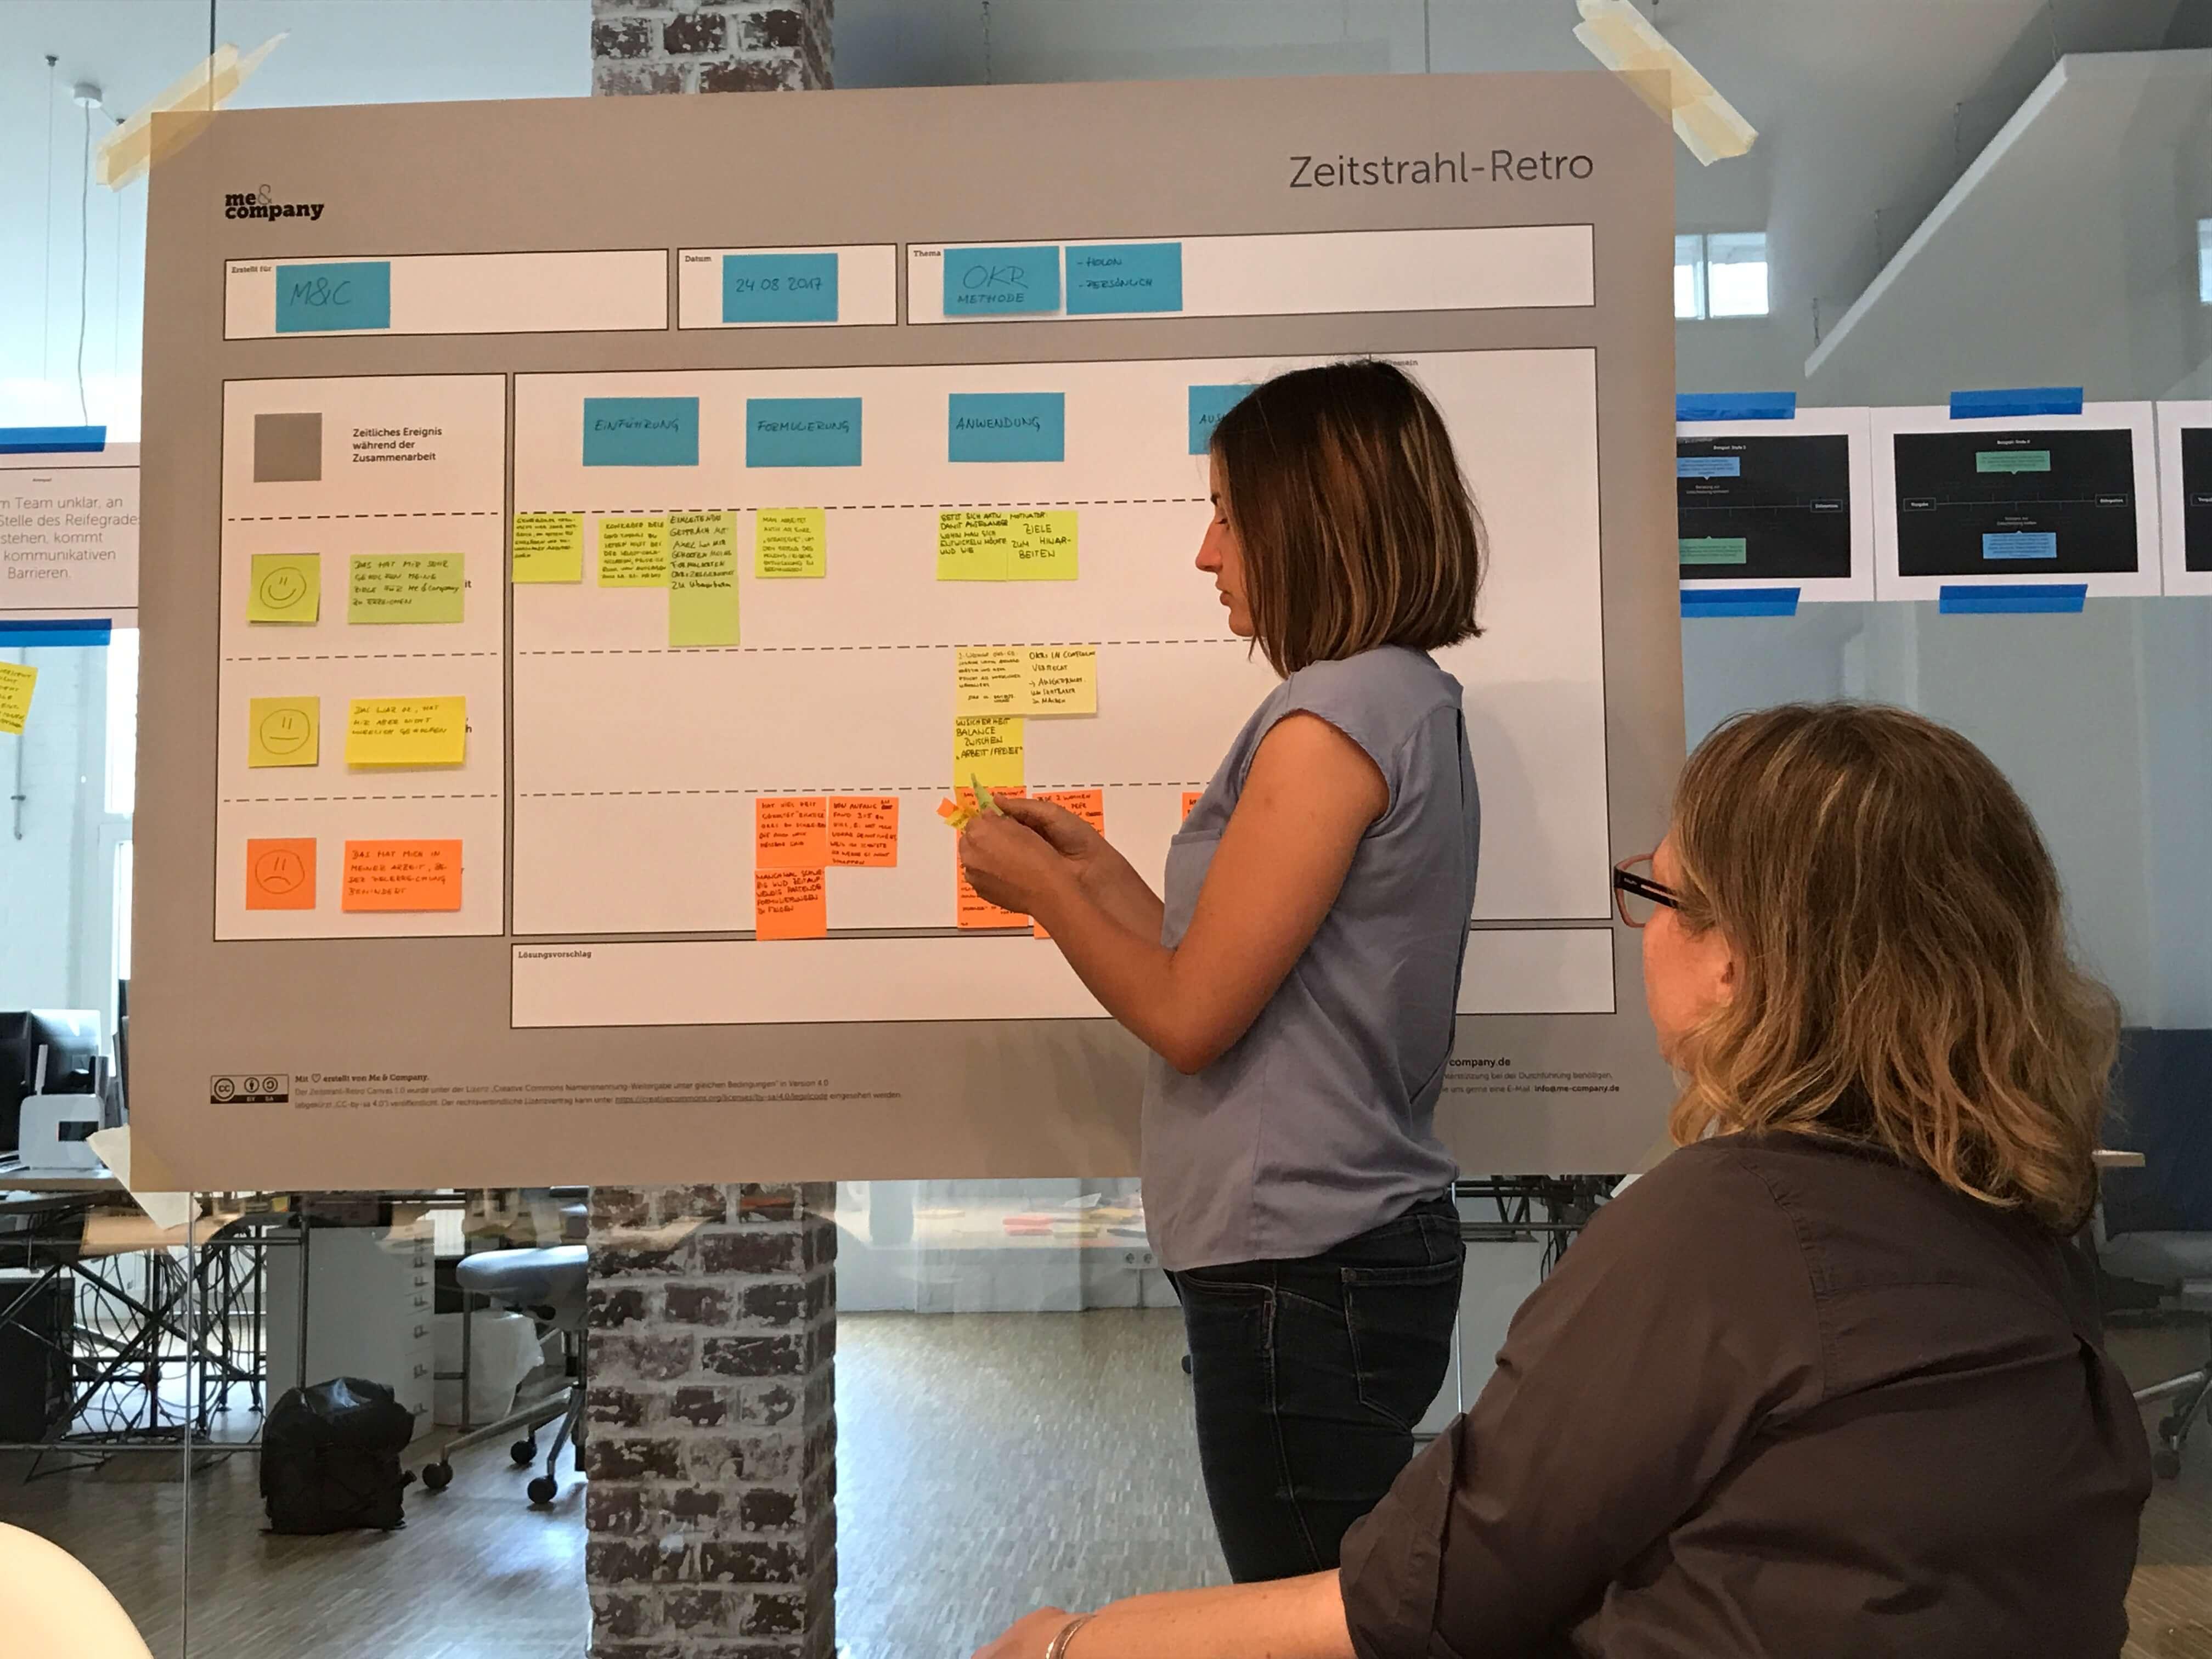 Agile Performance Management mit Zeitstrahl Retrospektive